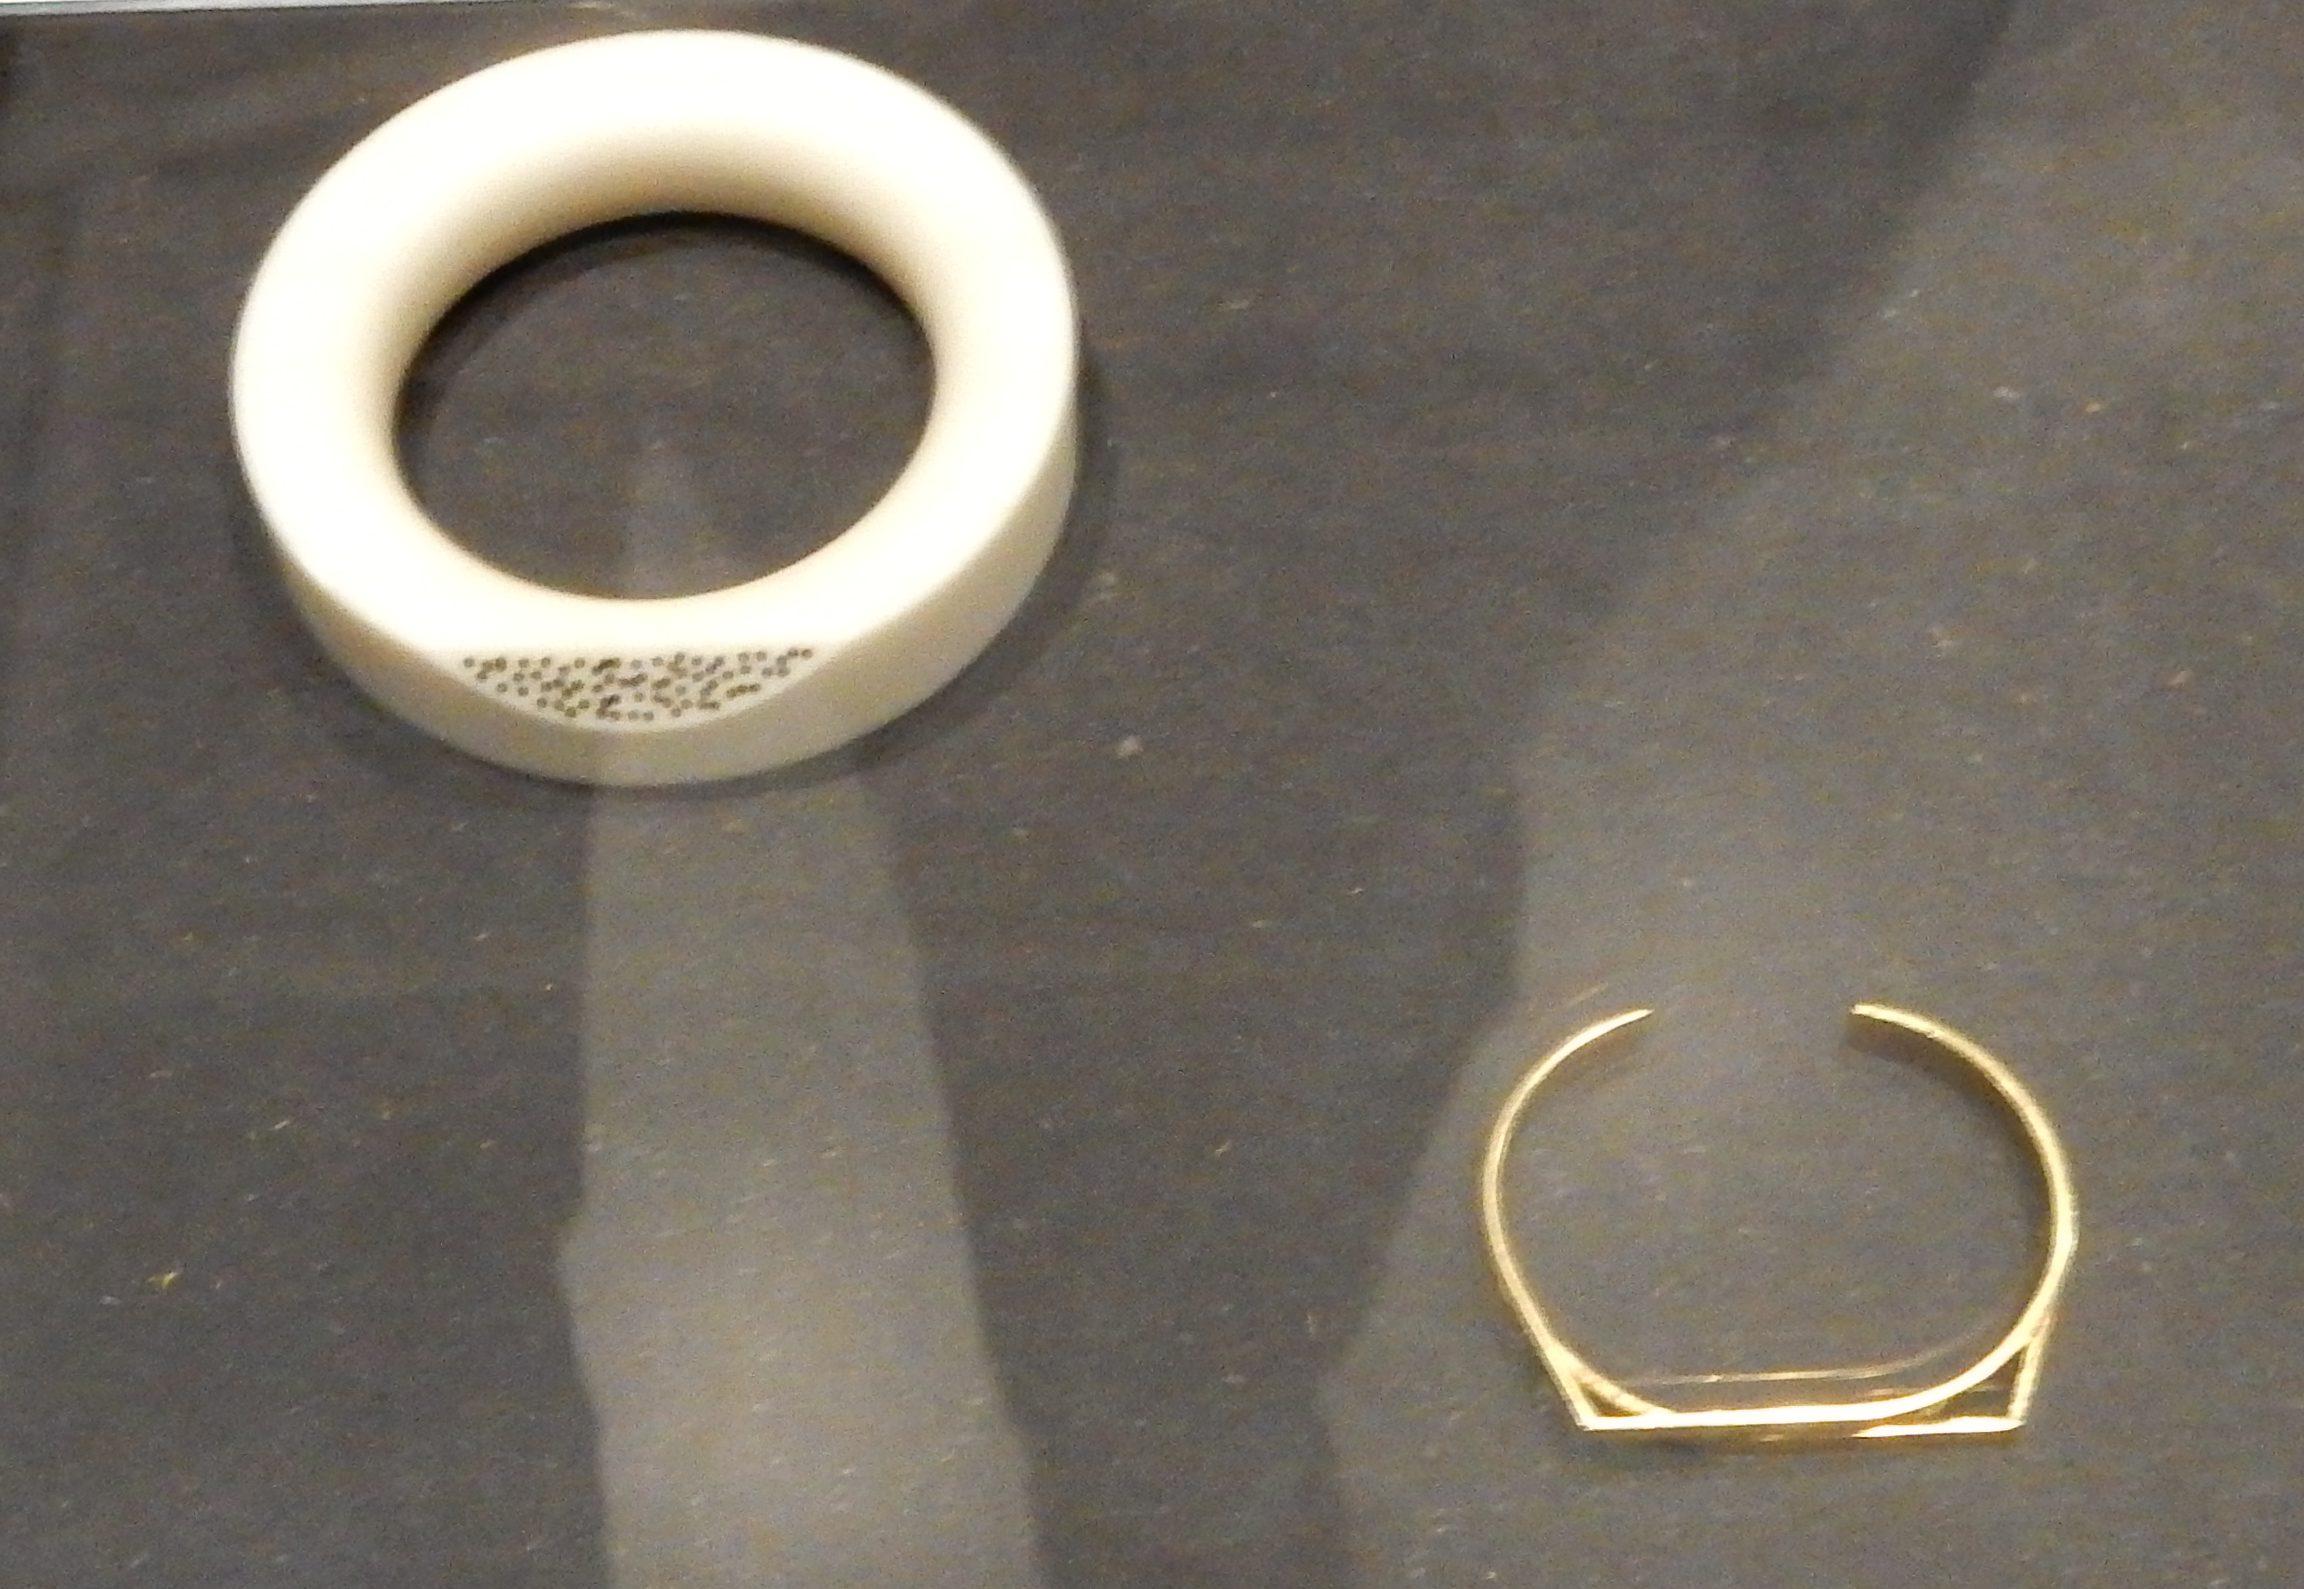 Hans Appenzeller, Corianarmband, 1981, Vlakjeasarmband, 1967. Show yourself, Design Museum Den Bosch, 2018, Collectie Yvònne Joris. Collectie DMDB, S2018.159 en 046. Foto Esther Doornbusch, 28 augustus 2018, CC BY 4.0